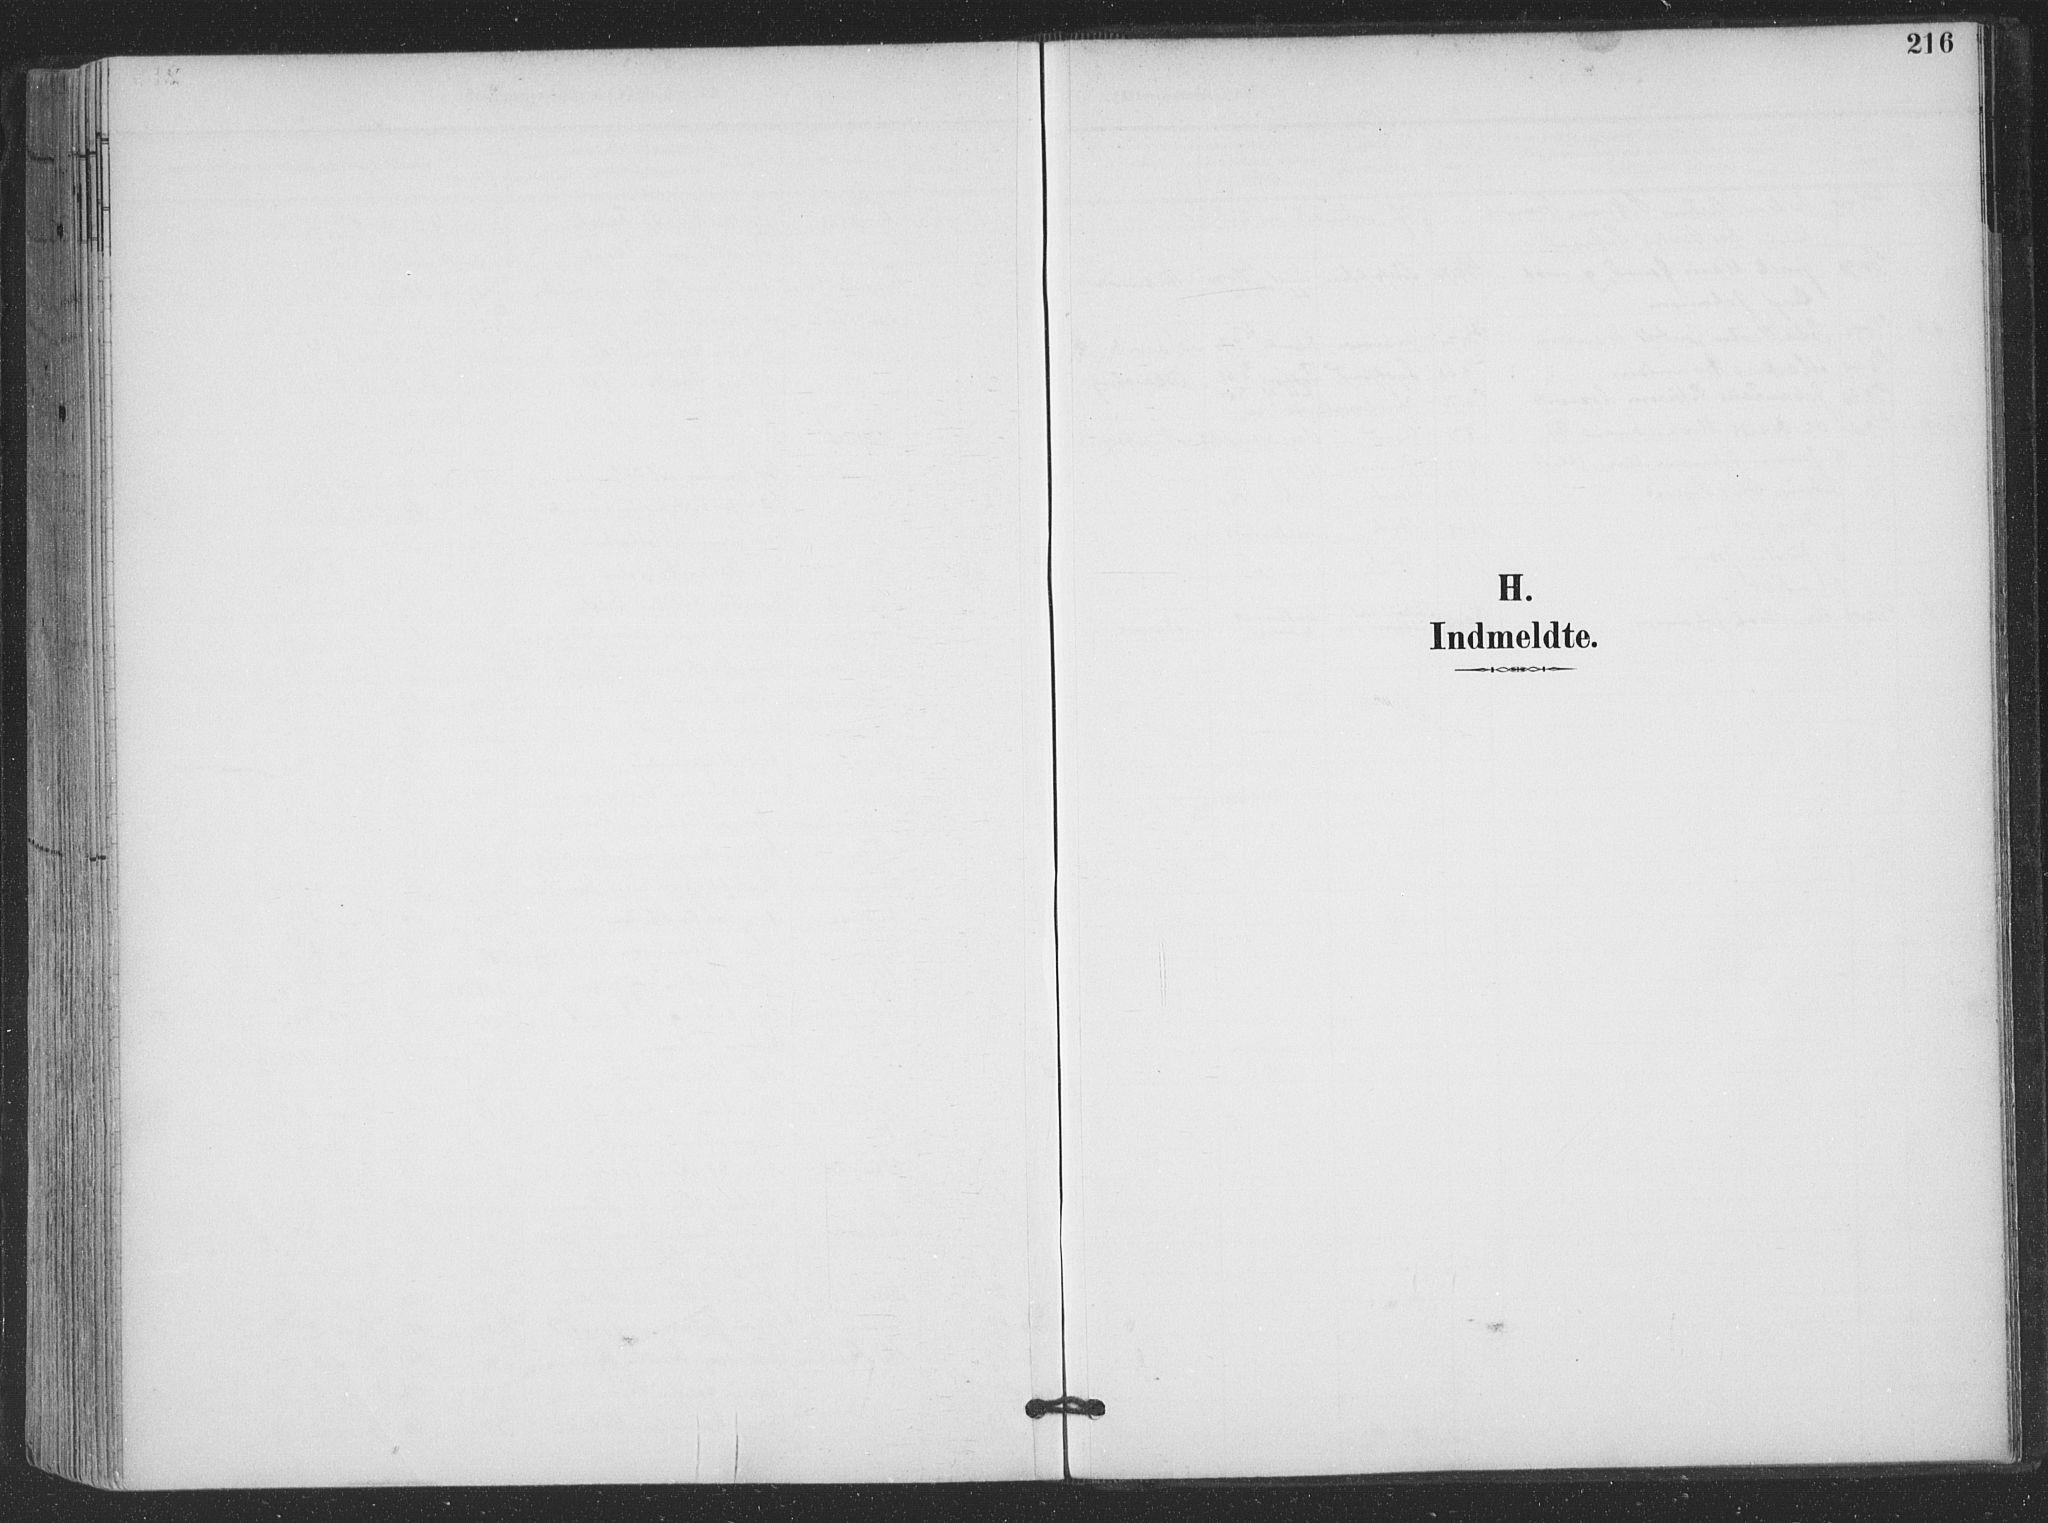 SAT, Ministerialprotokoller, klokkerbøker og fødselsregistre - Nordland, 866/L0939: Ministerialbok nr. 866A02, 1894-1906, s. 216